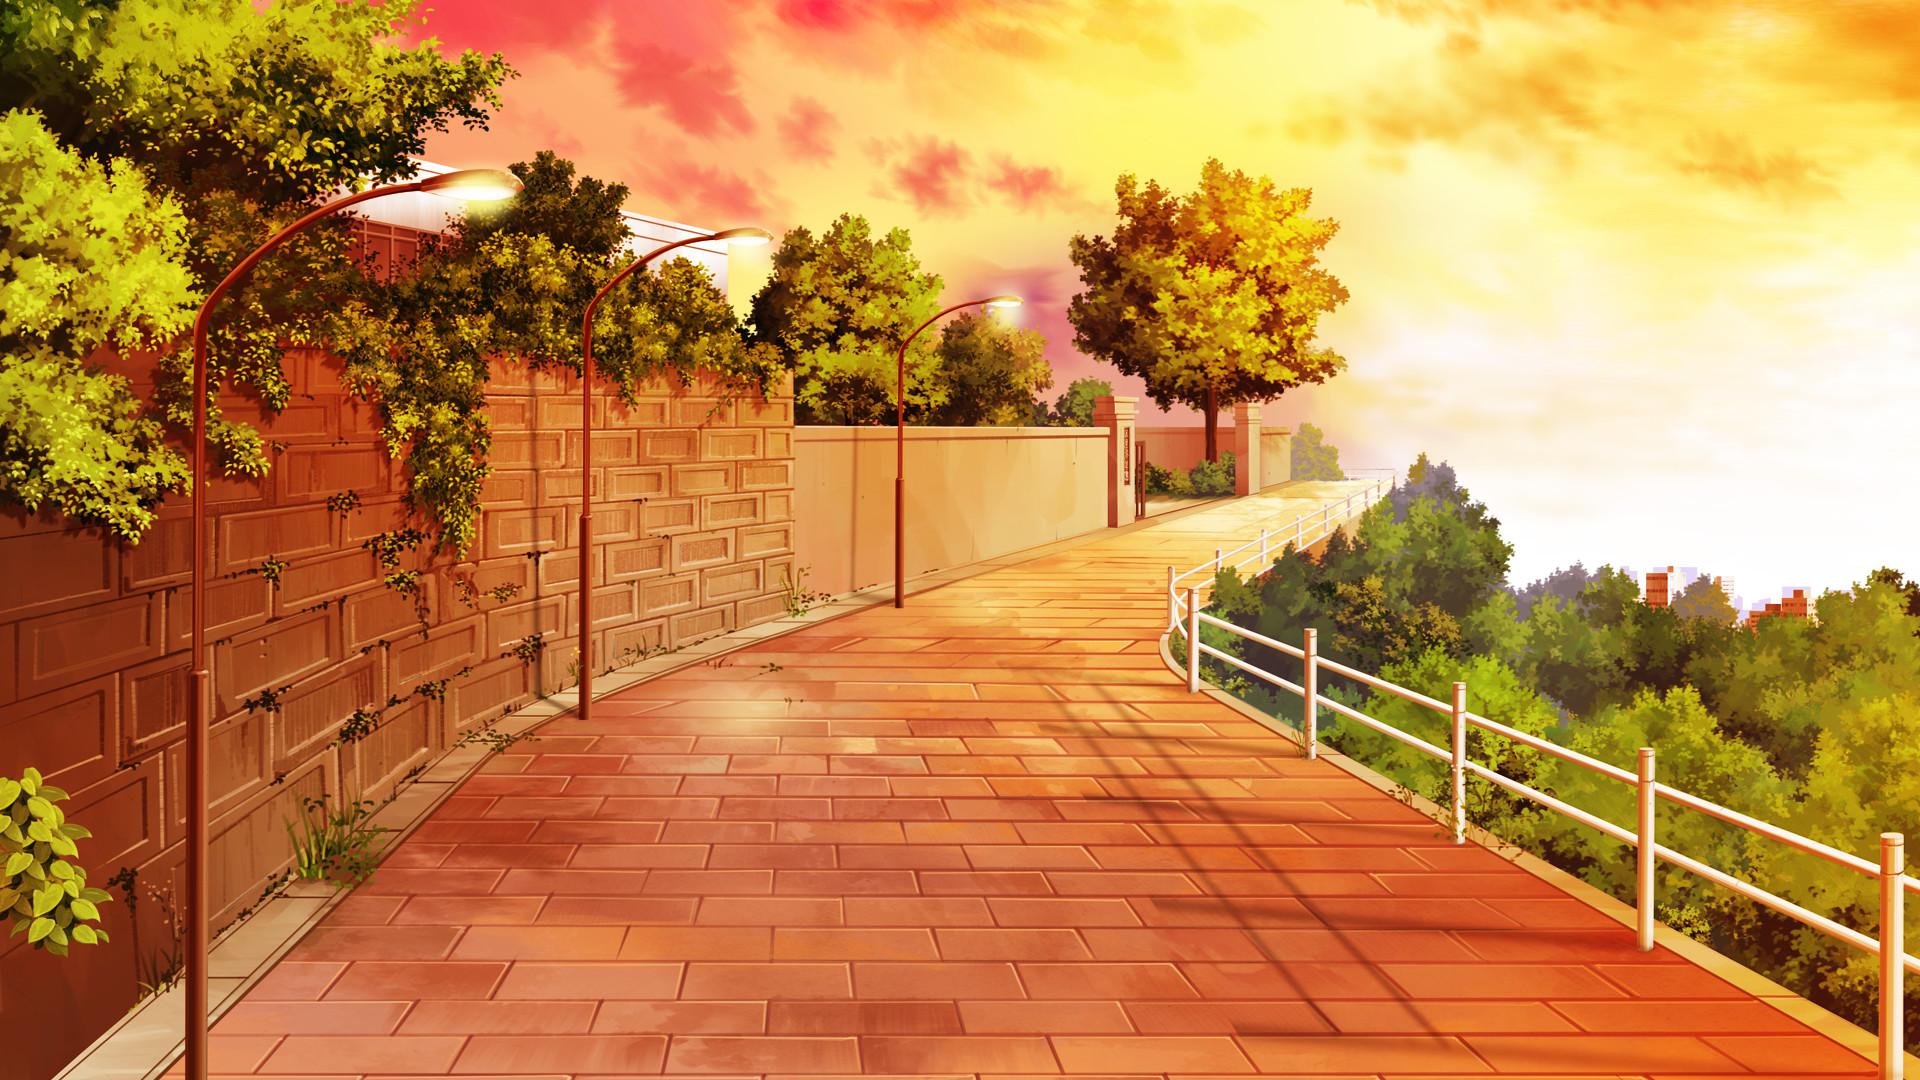 Anime City Scenery Wallpaper Widescreen 2 HD Wallpapers